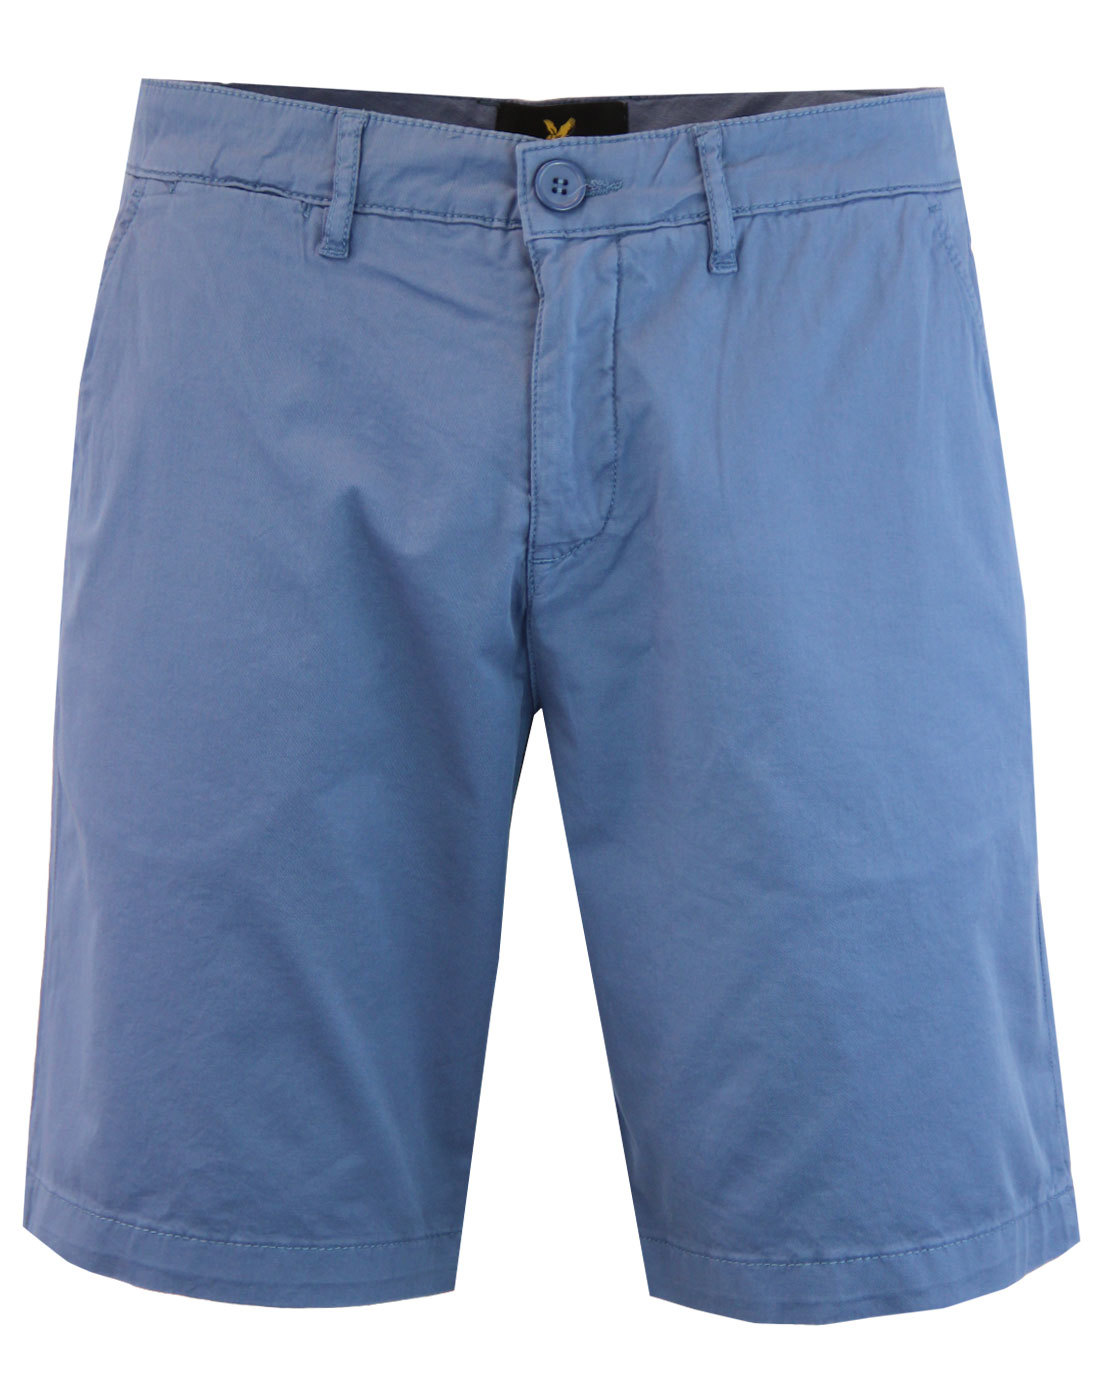 LYLE & SCOTT Men's Garment Dye Shorts MOONLIGHT